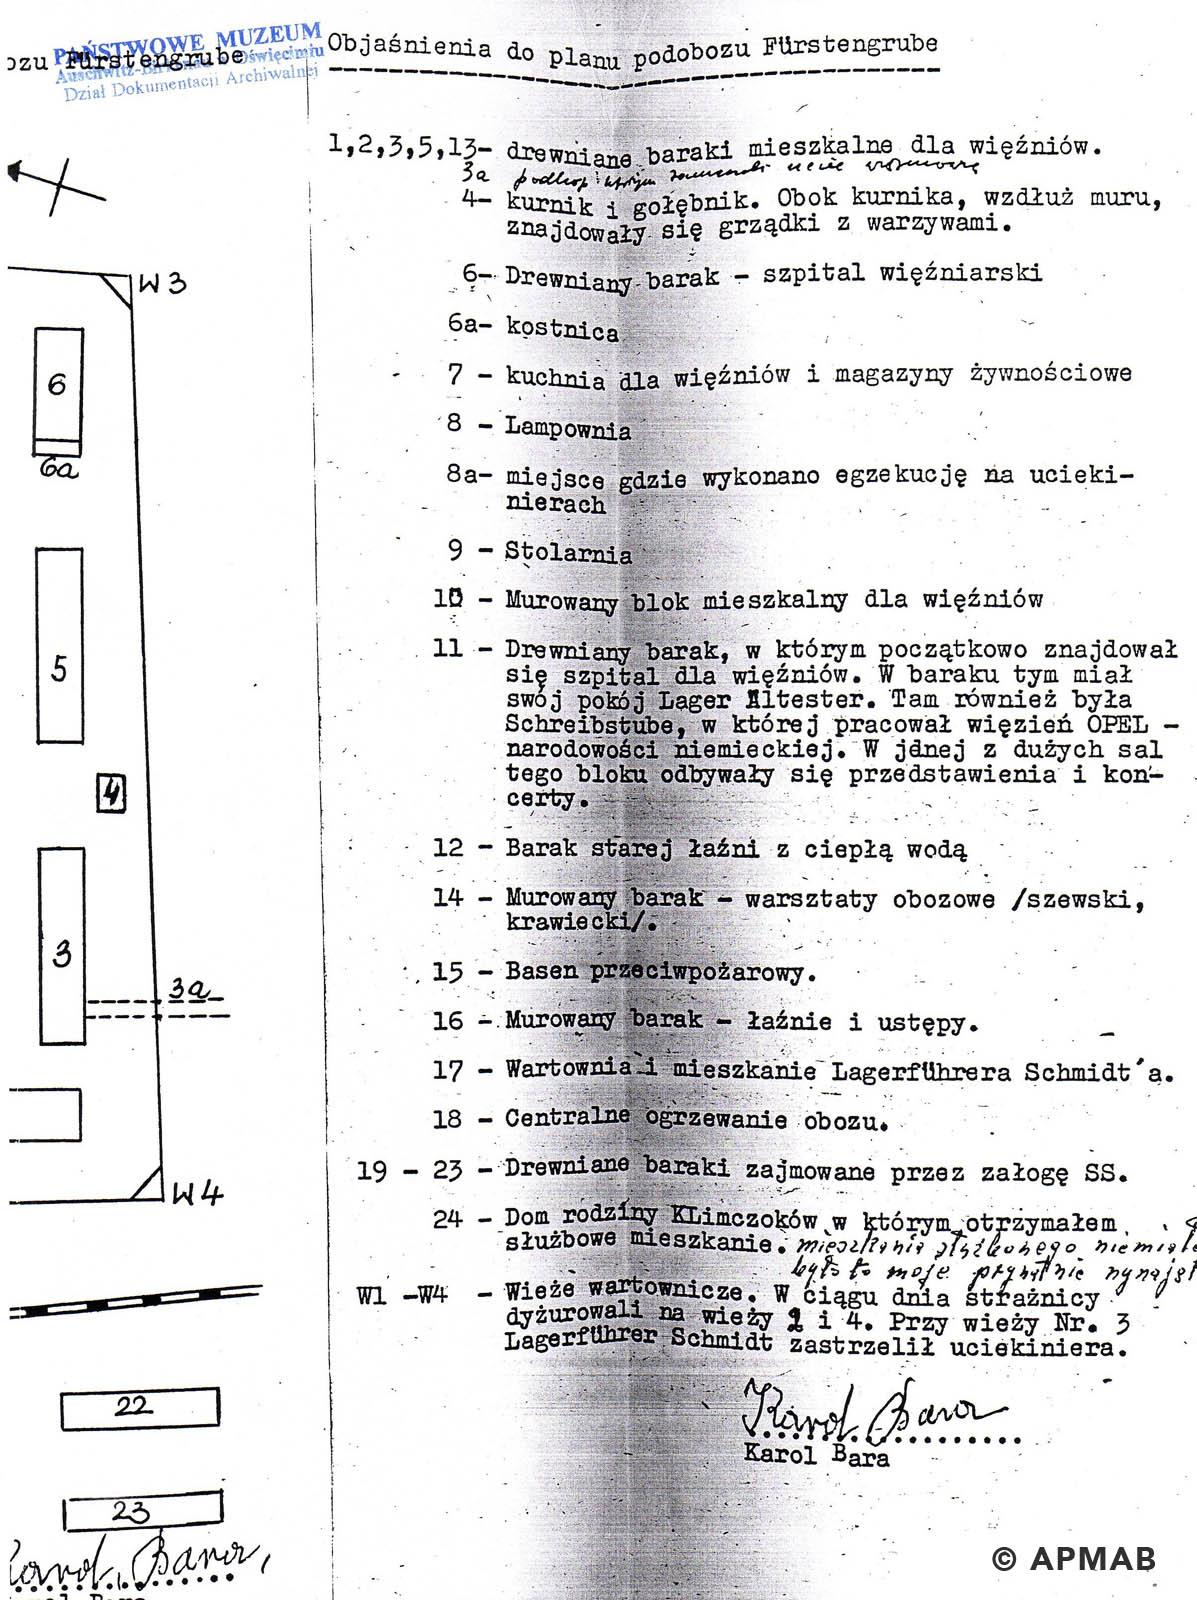 Former prisoner drawing of Fürstengrube sub camp. D1. APMAB